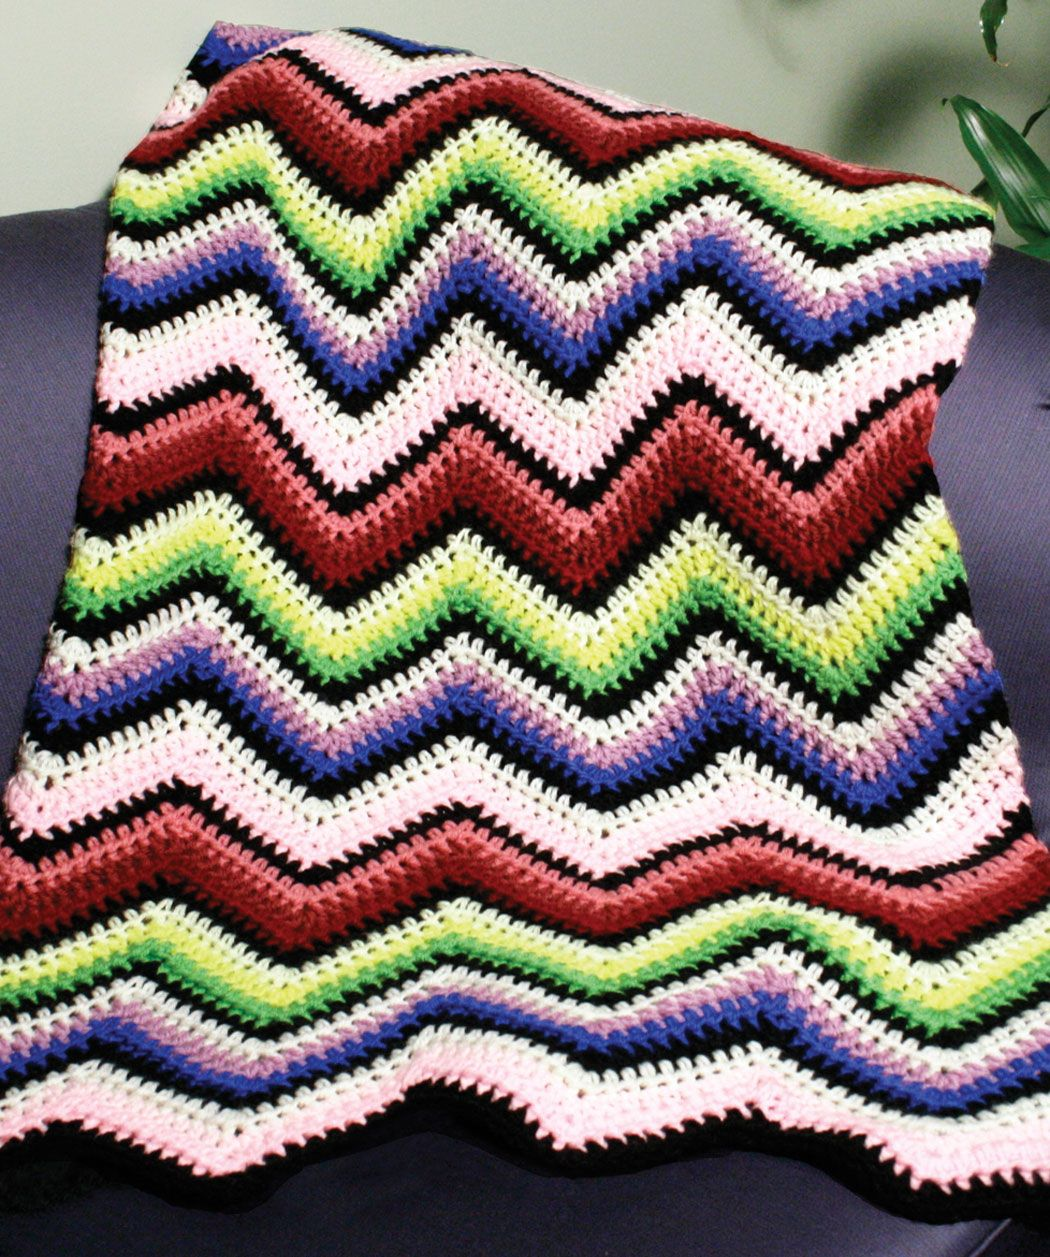 Crochet Rainbow Ripple Afghan   Crochet Afghans & Throws   Pinterest ...